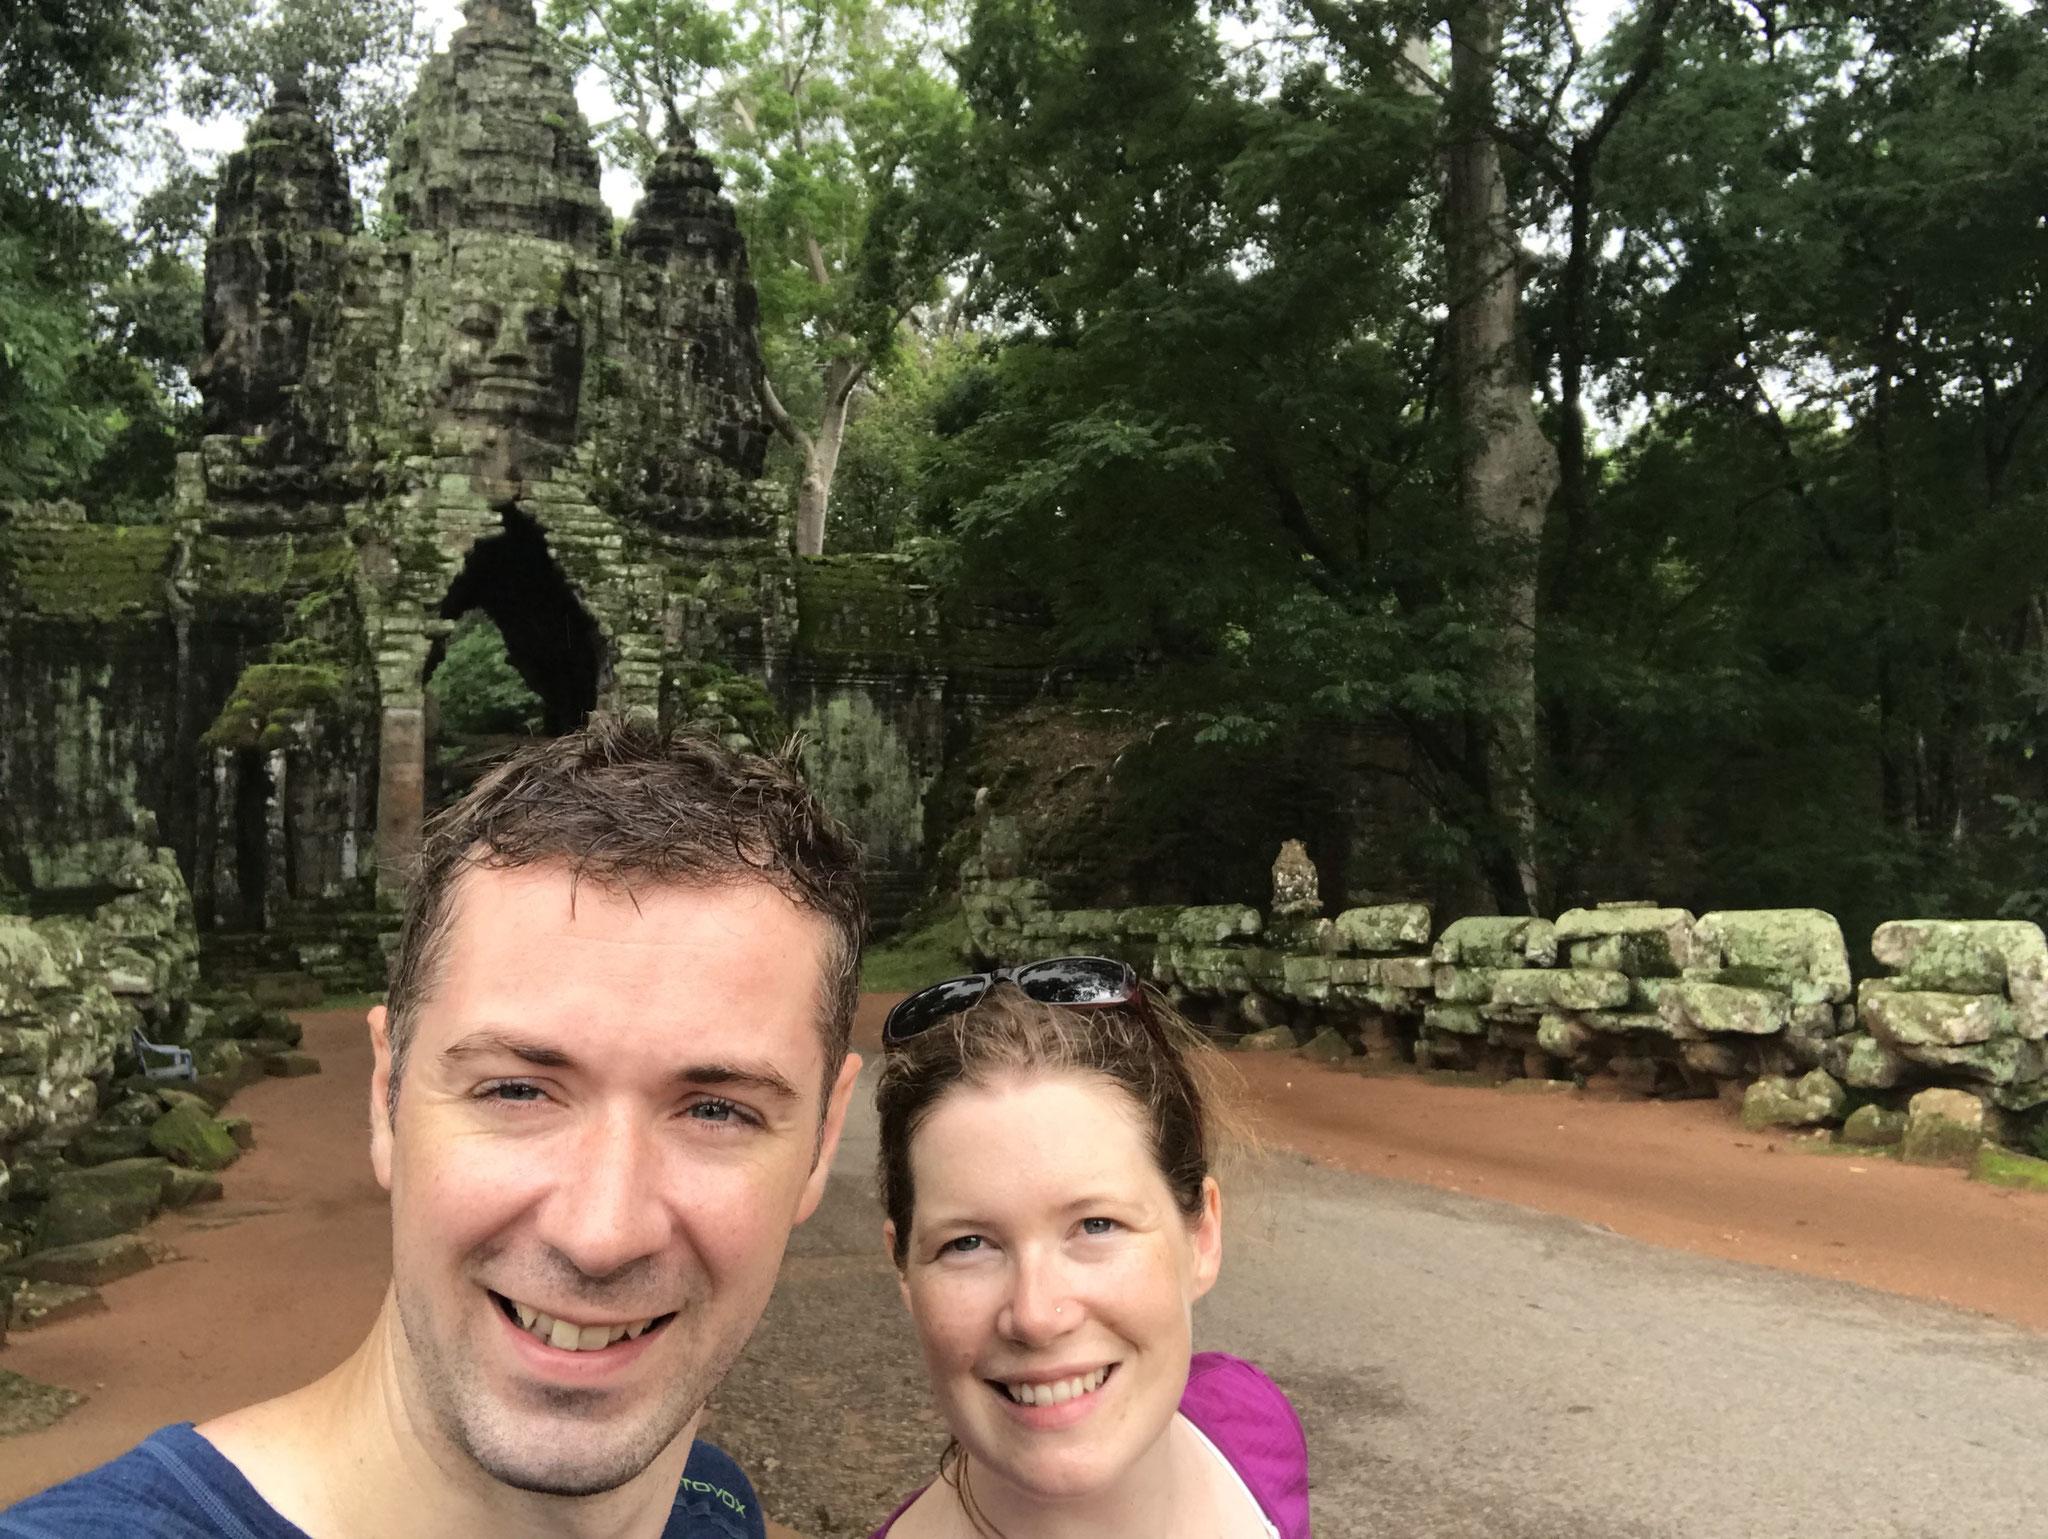 Vor dem Eingang zu Angkor Thom